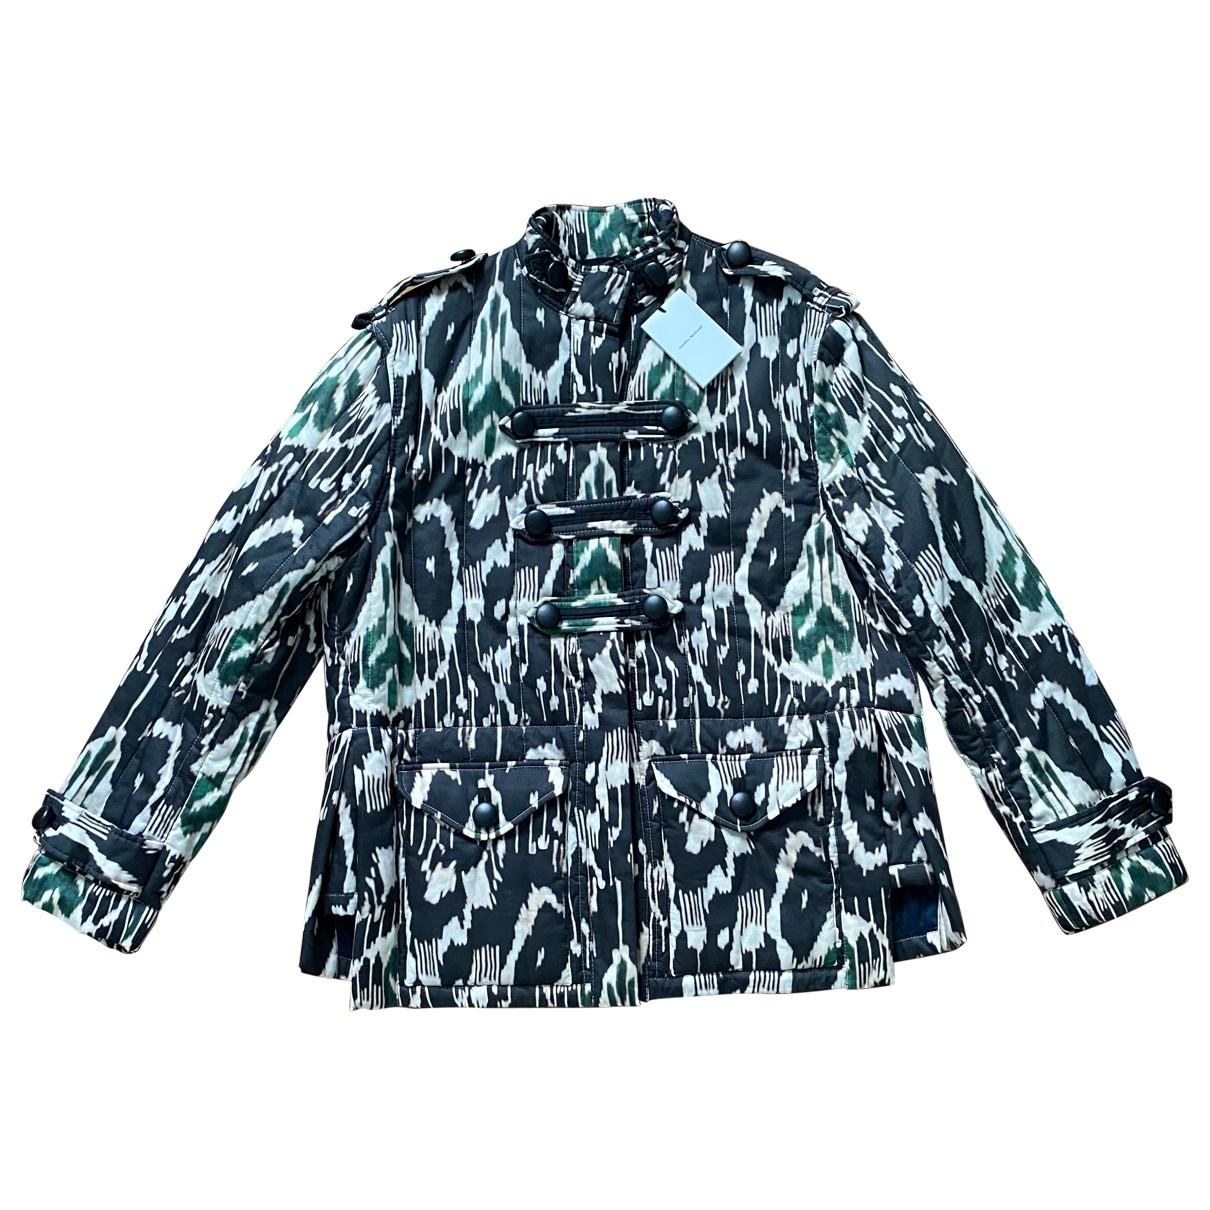 Isabel Marant N Multicolour Cotton jacket for Women 38 FR